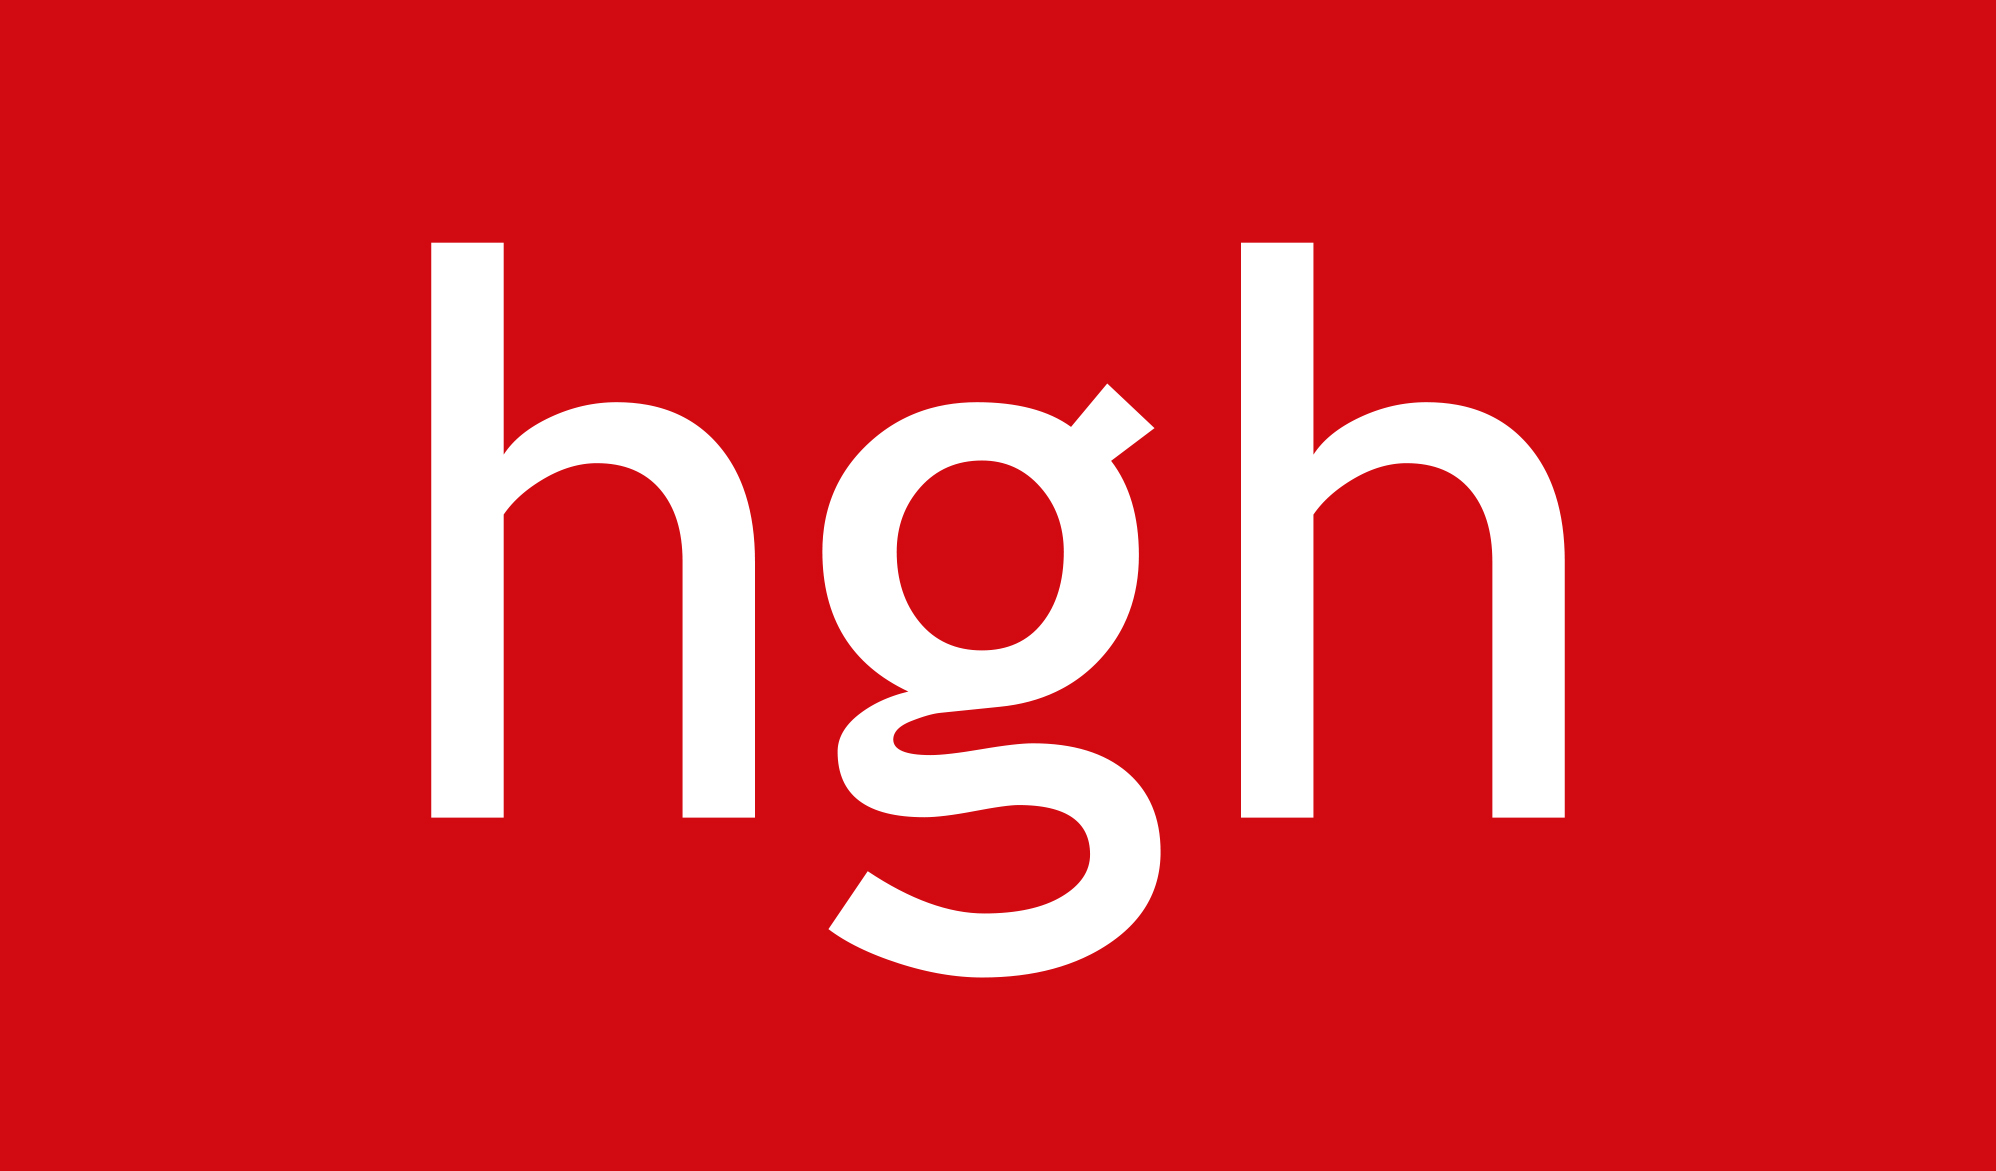 hgh_Logo_POS_RGB.jpg